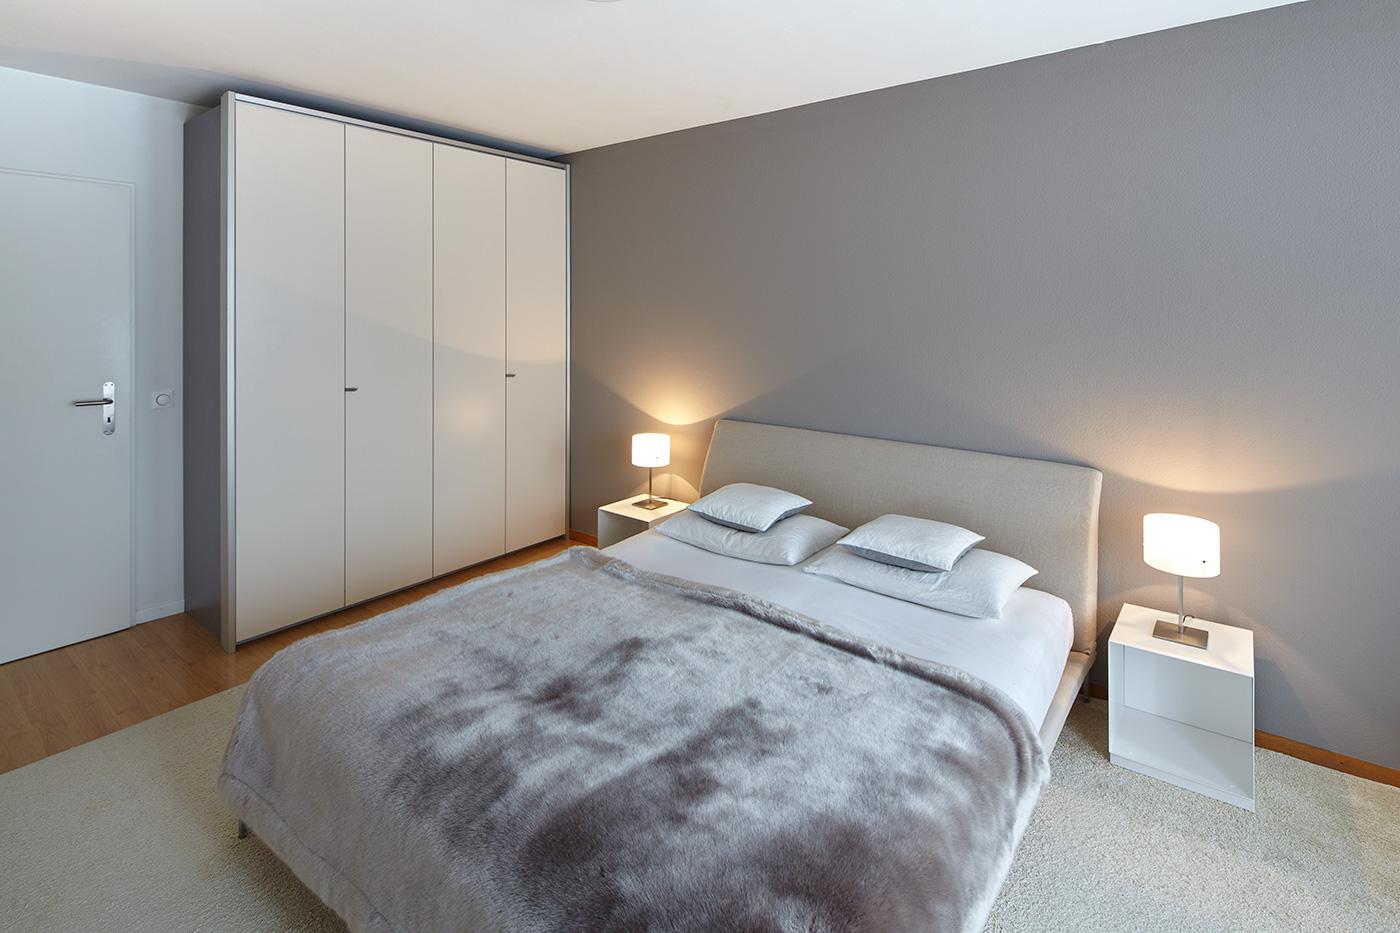 Bedroom 5,5-Room Apartment Höngg